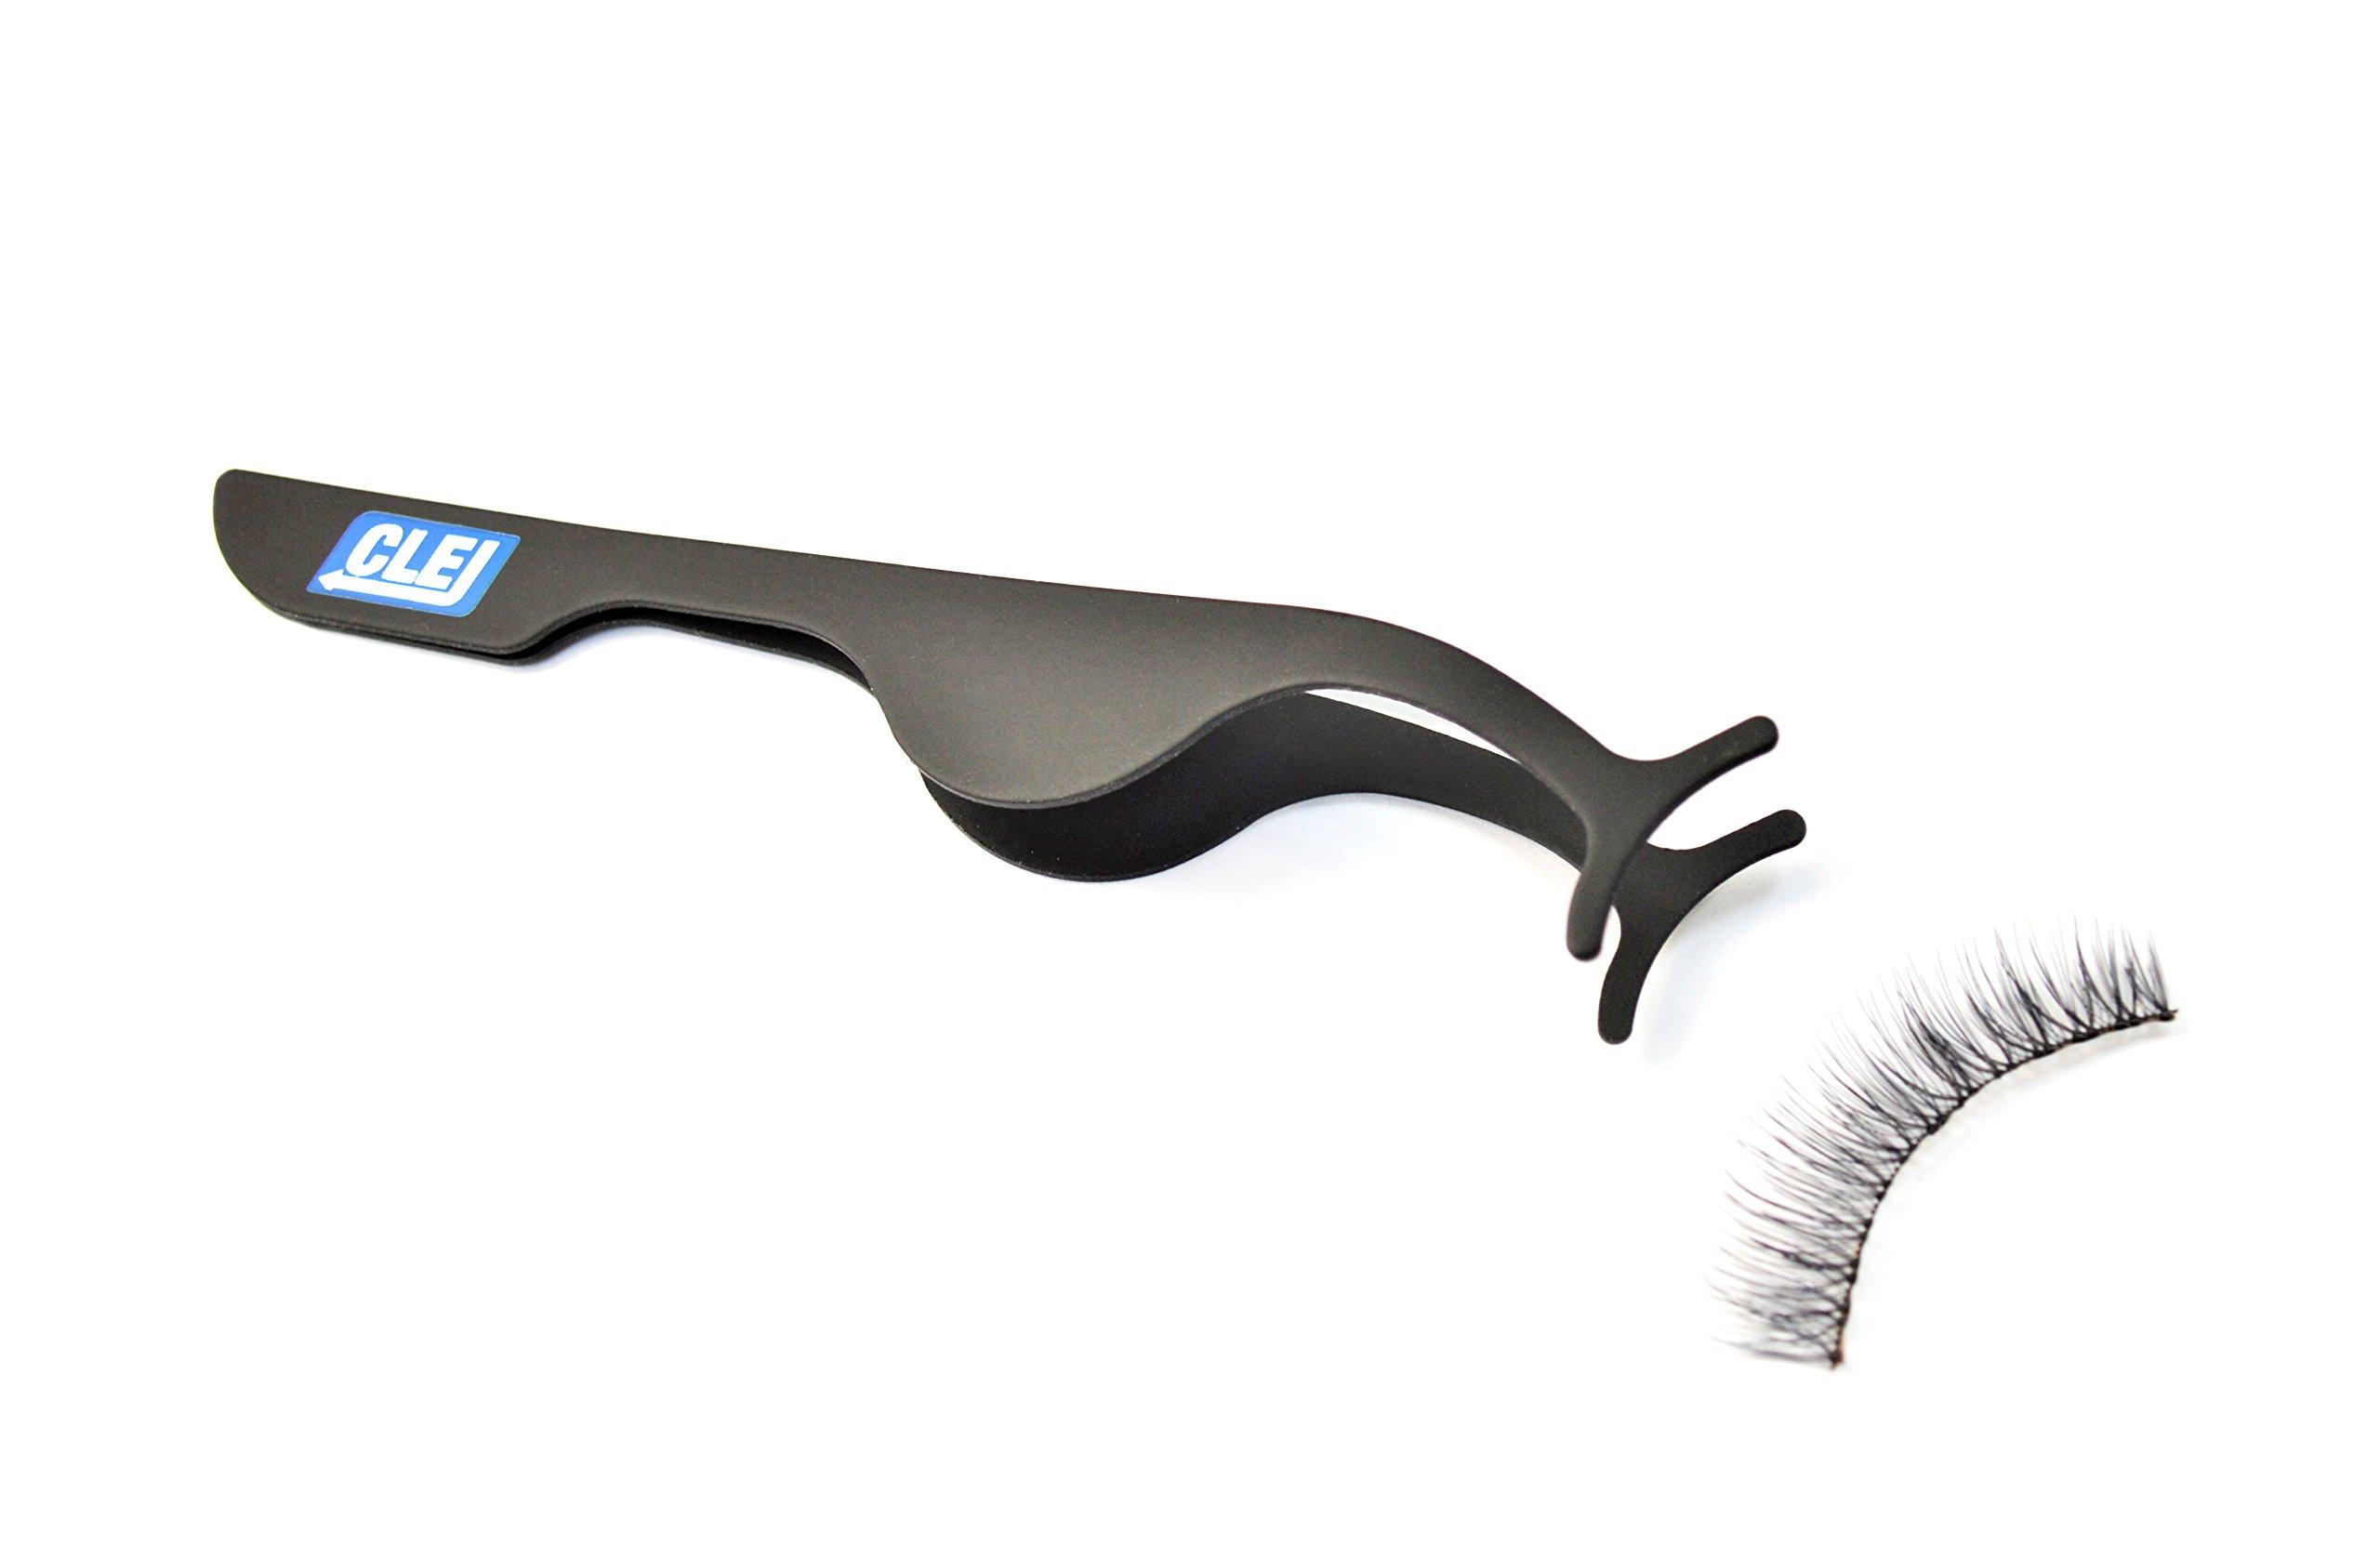 Amazon False Eyelash Applicatorpremium Stainless Steel